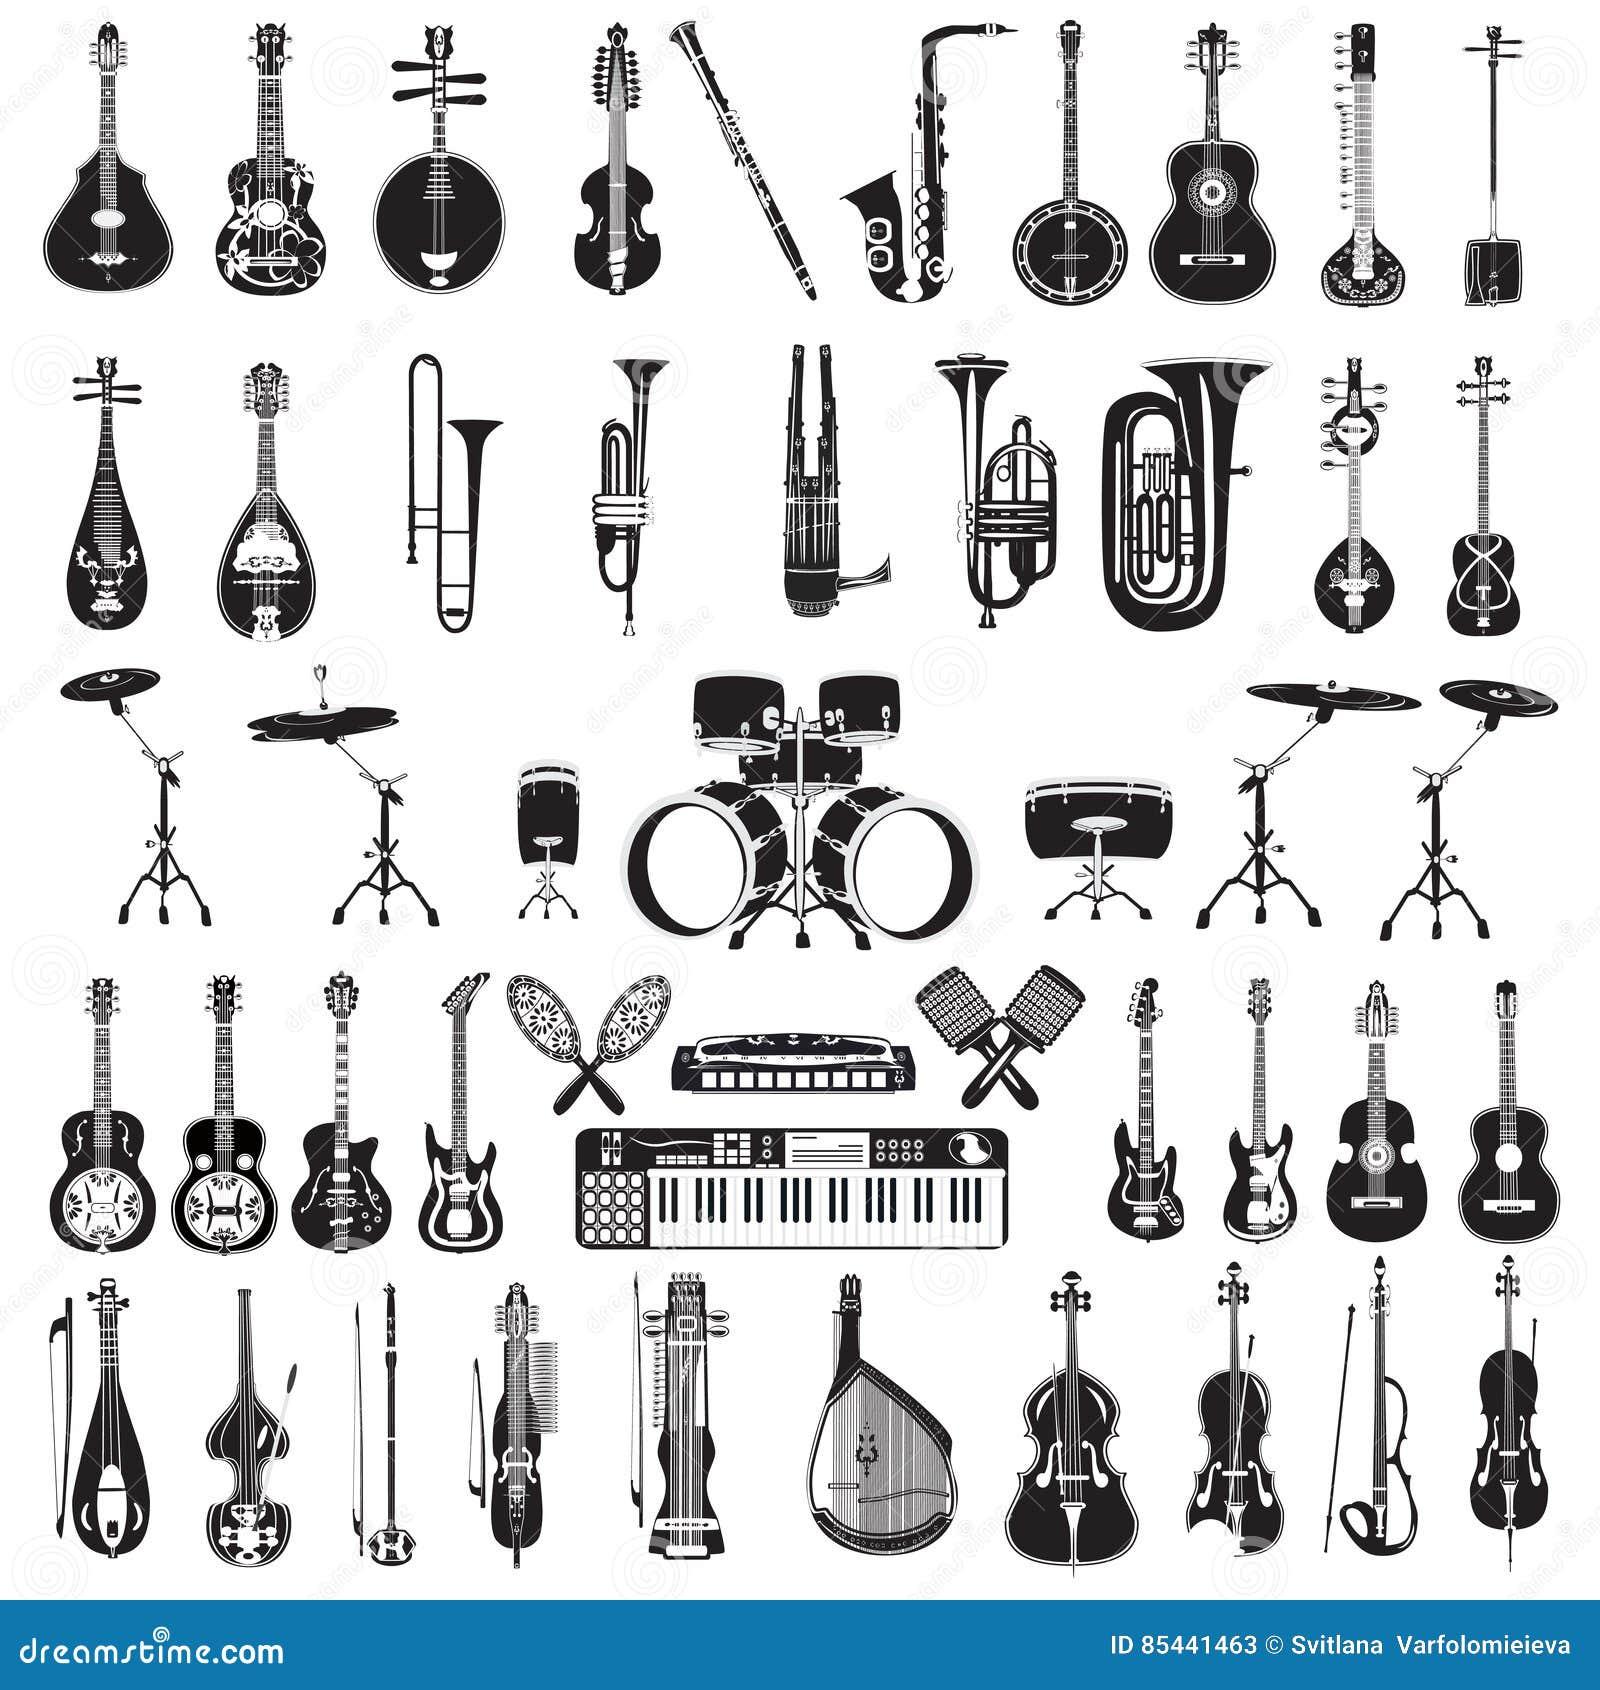 Grupo de instrumentos musicais preto e branco, estilo liso do vetor